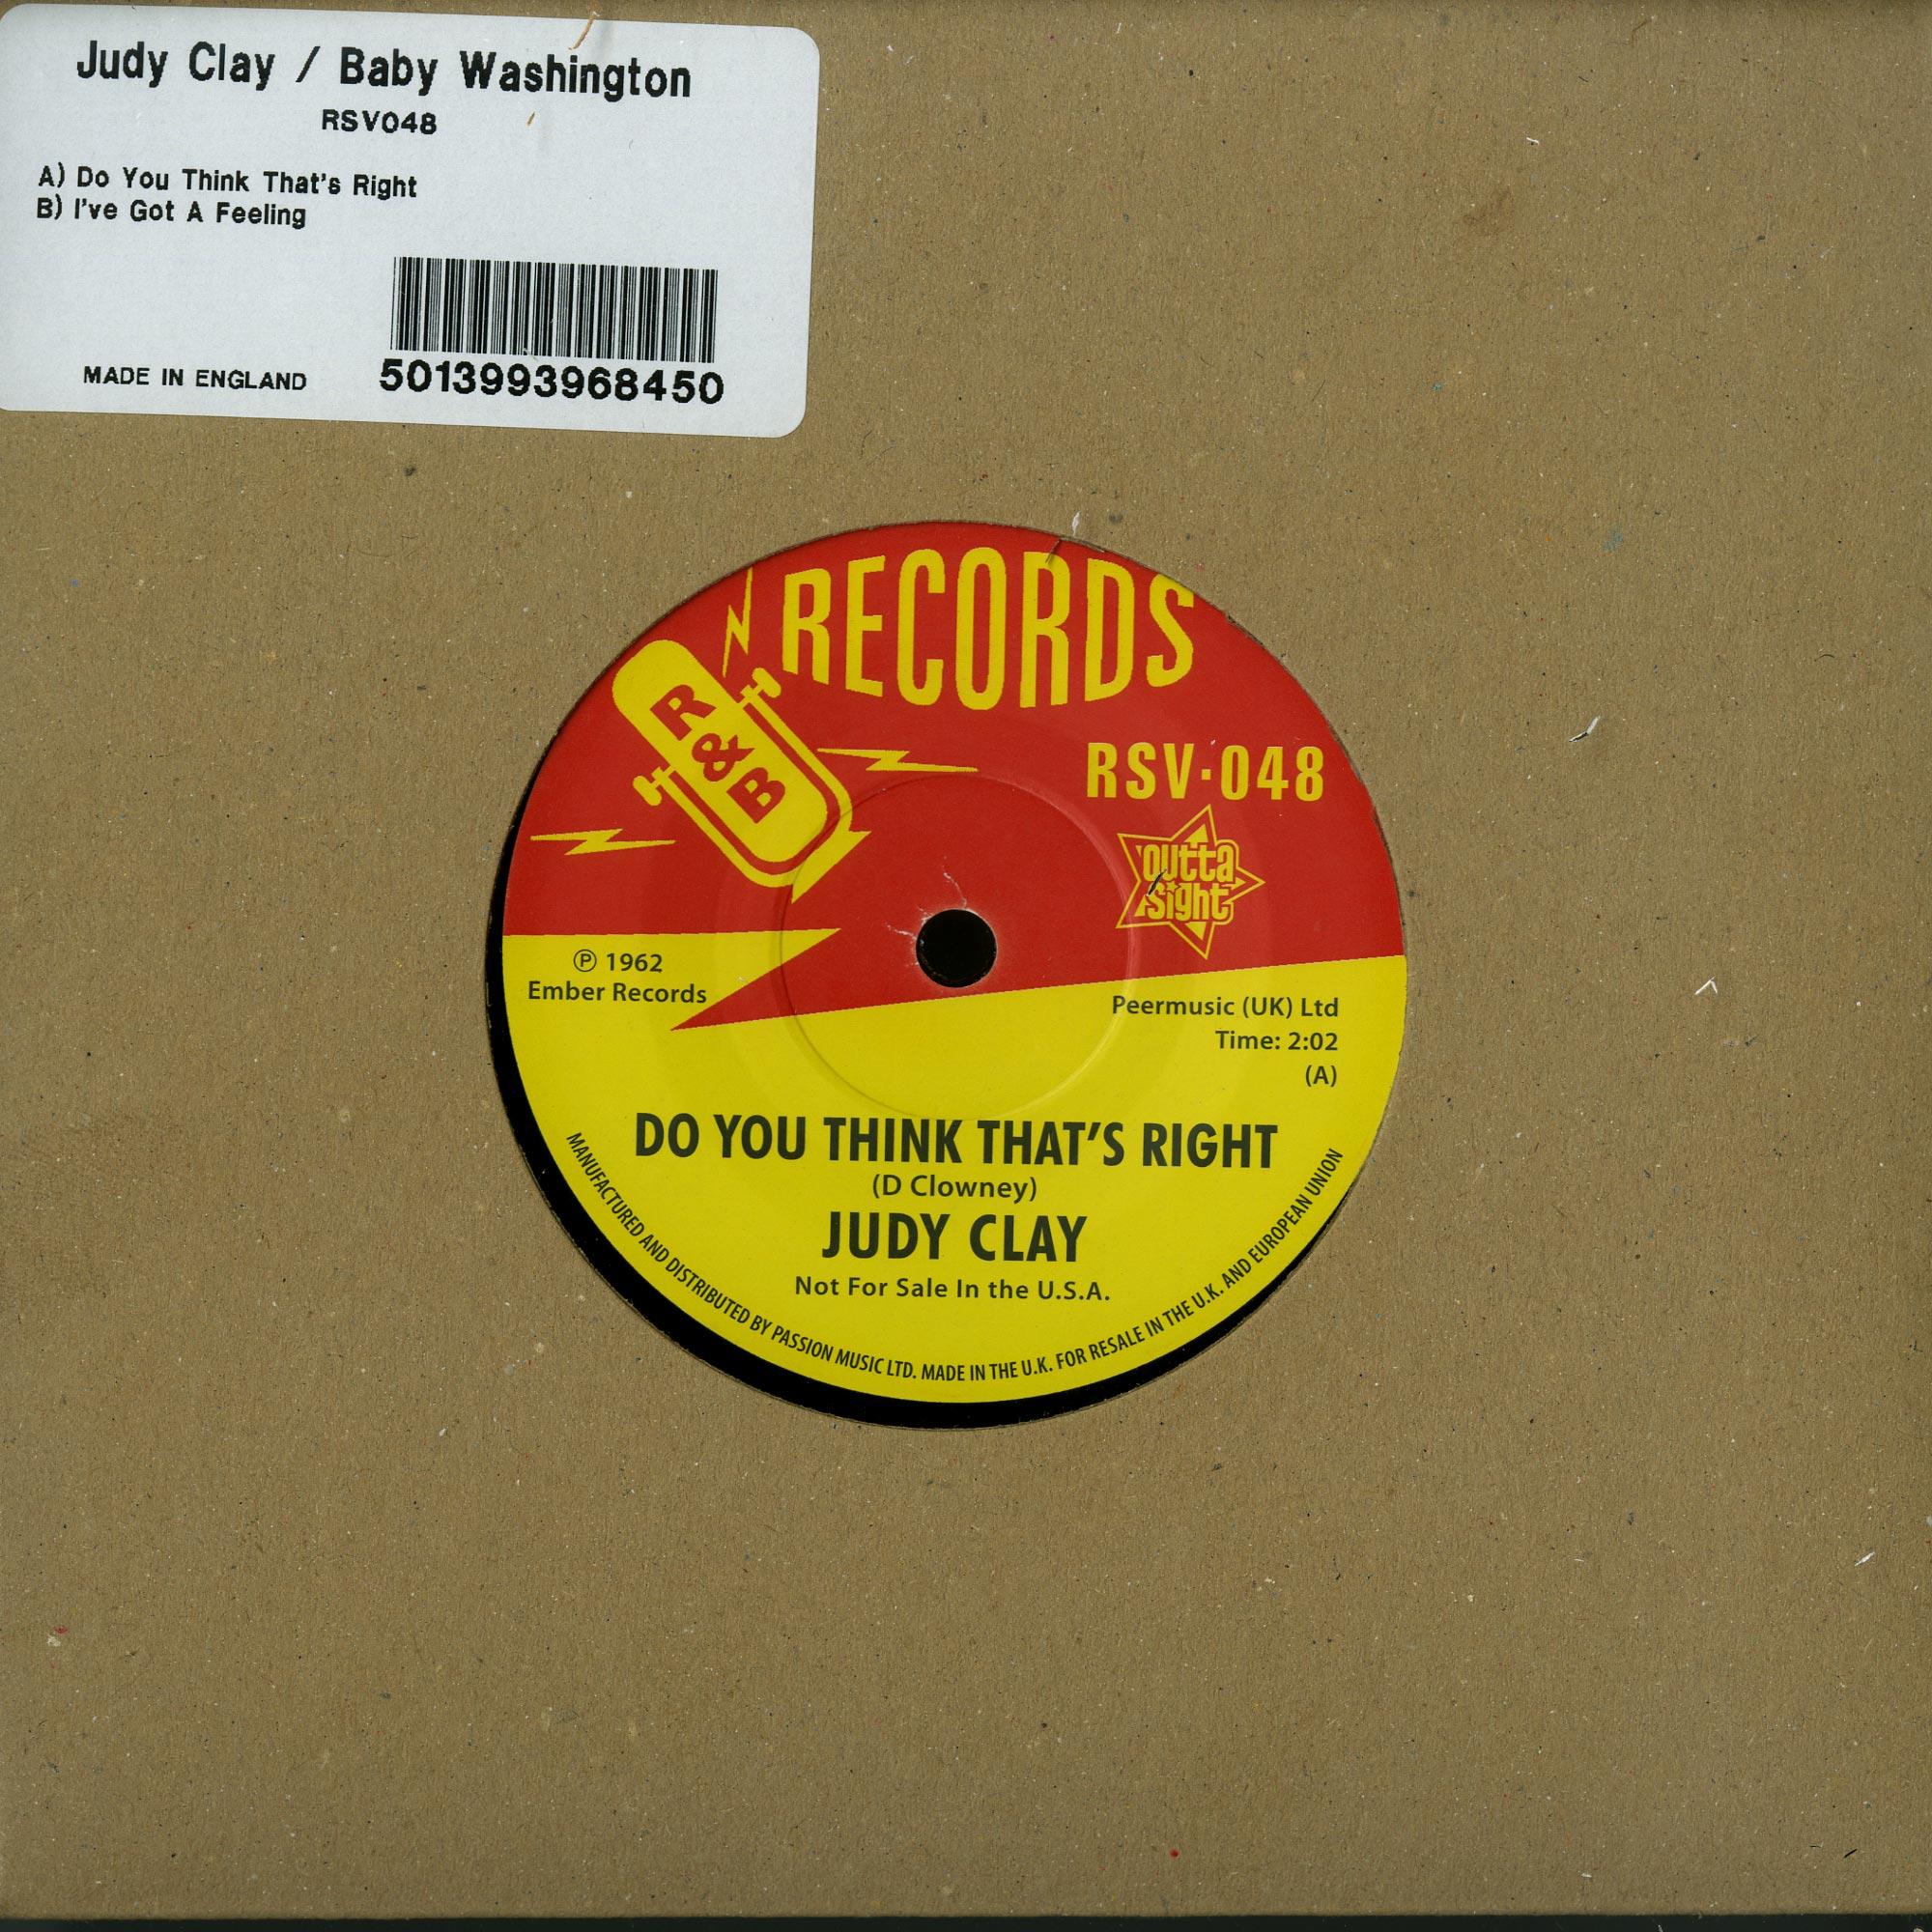 Judy Clay / Baby Washington - DO YOU THINK THATS RIGHT / I VE GOT A FEELING